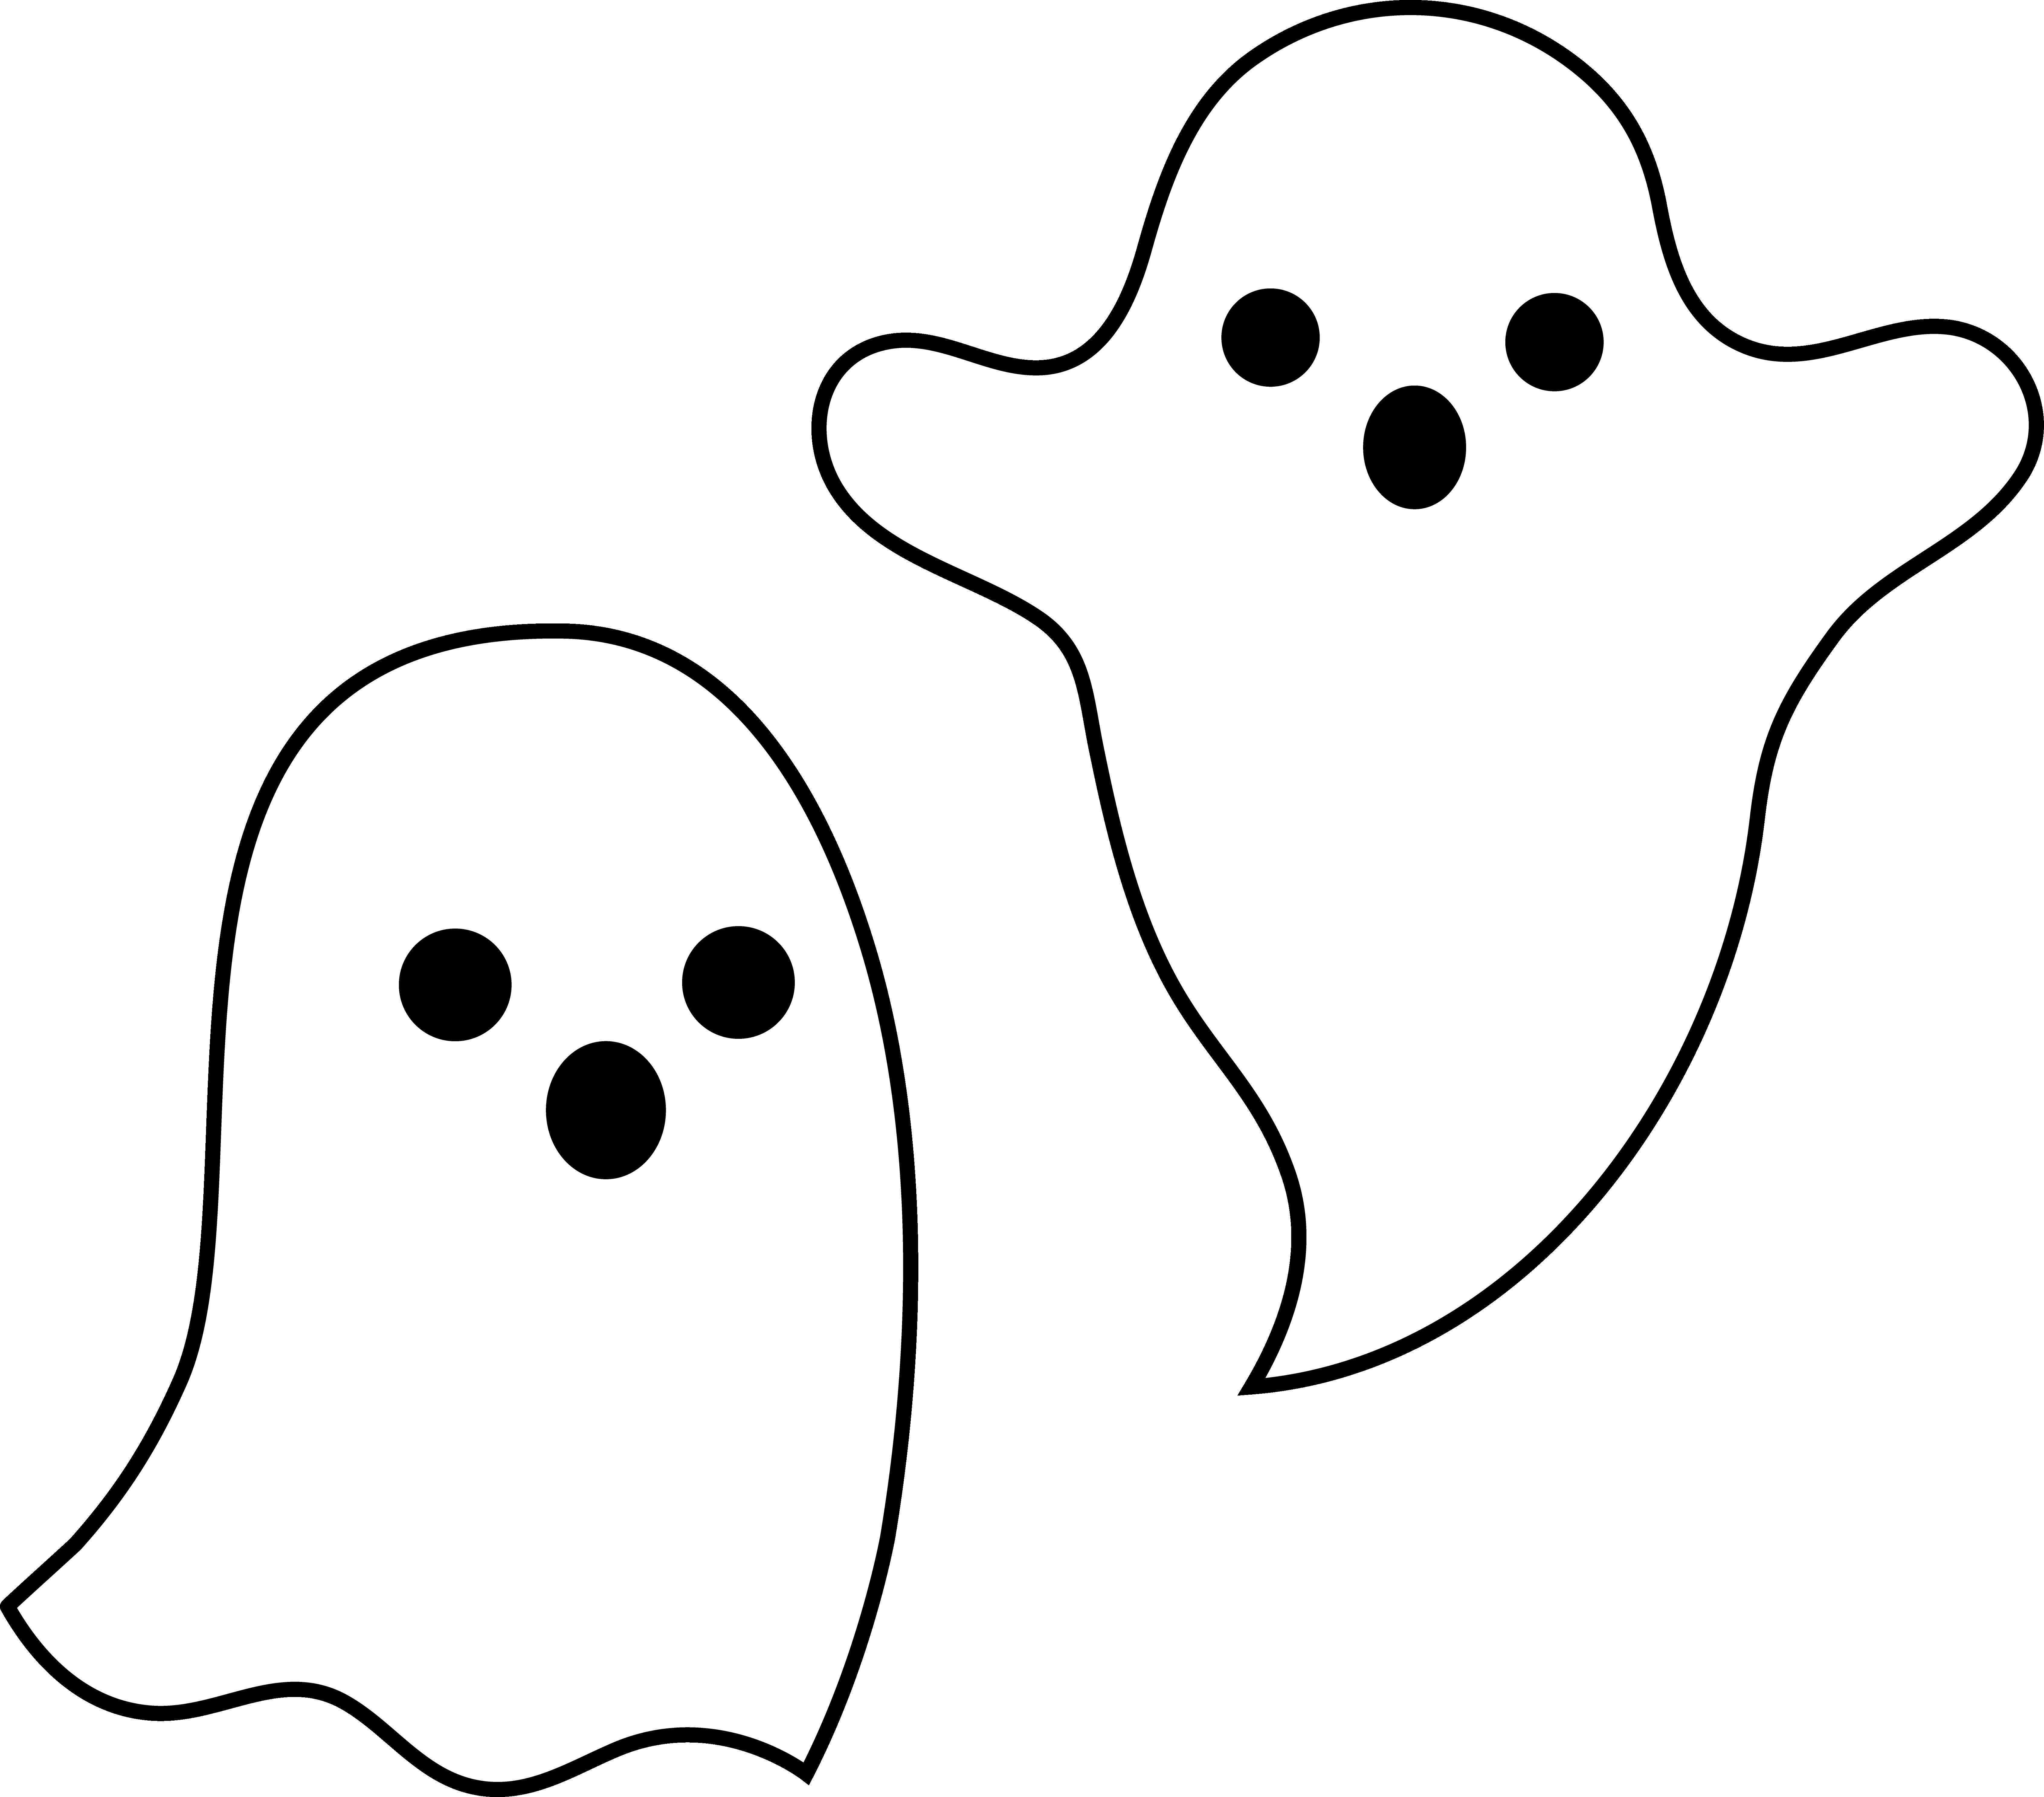 Cute Ghost Clipart #1.